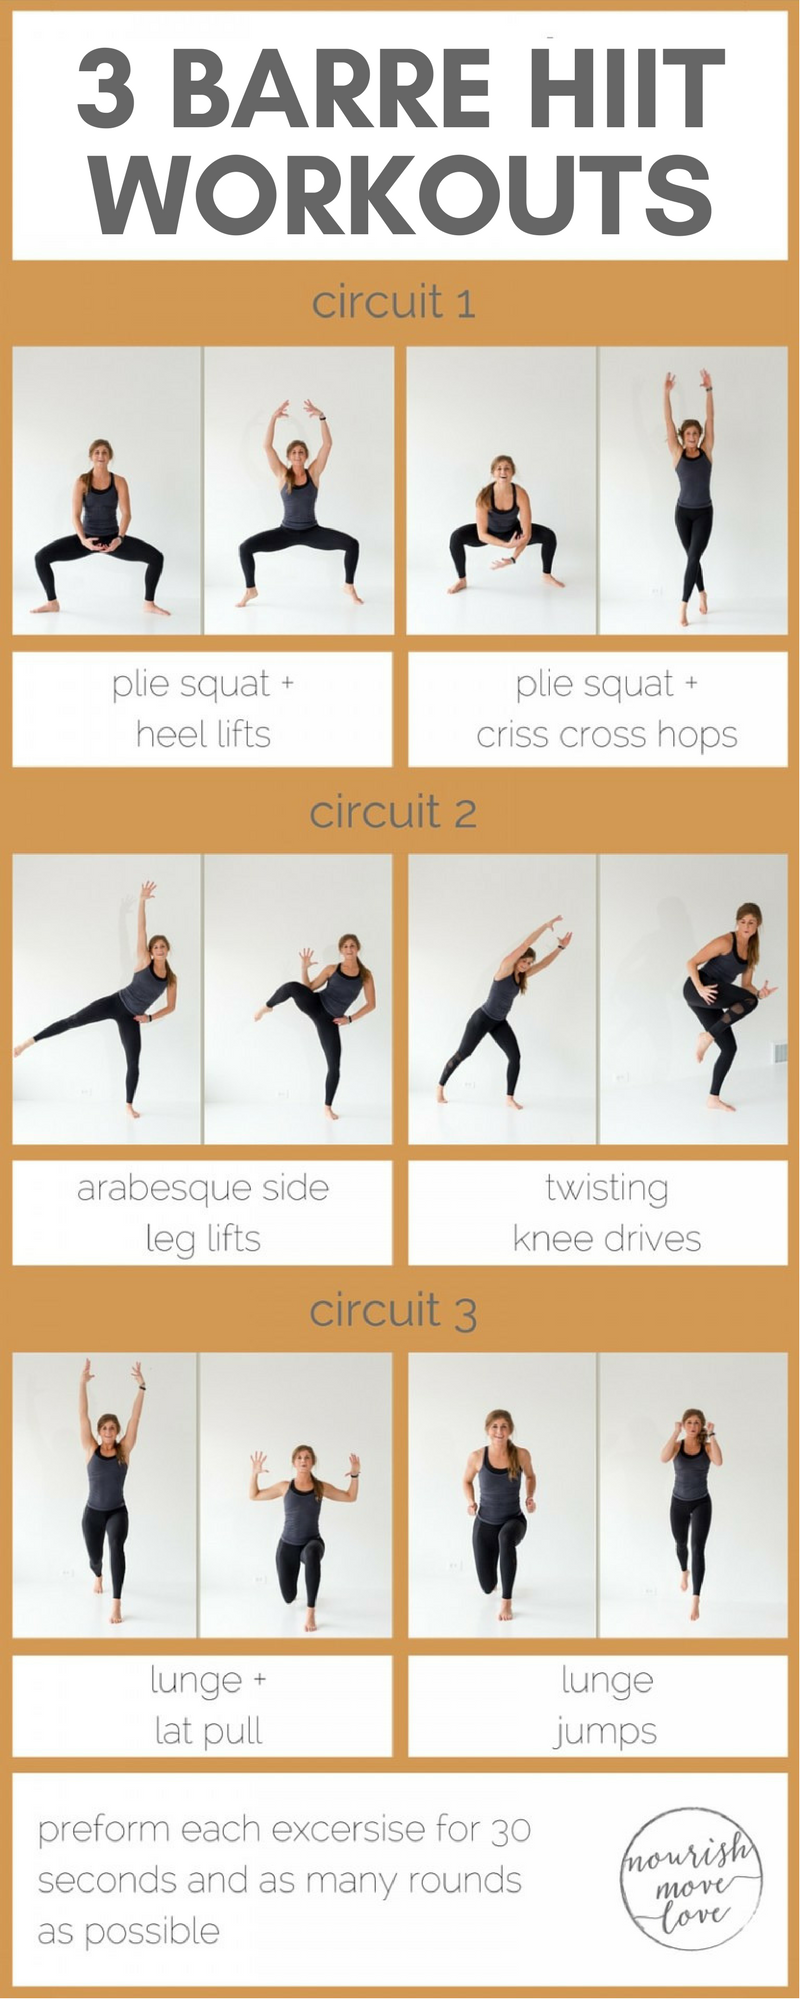 3 Barre HIIT Workouts - Get Healthy U